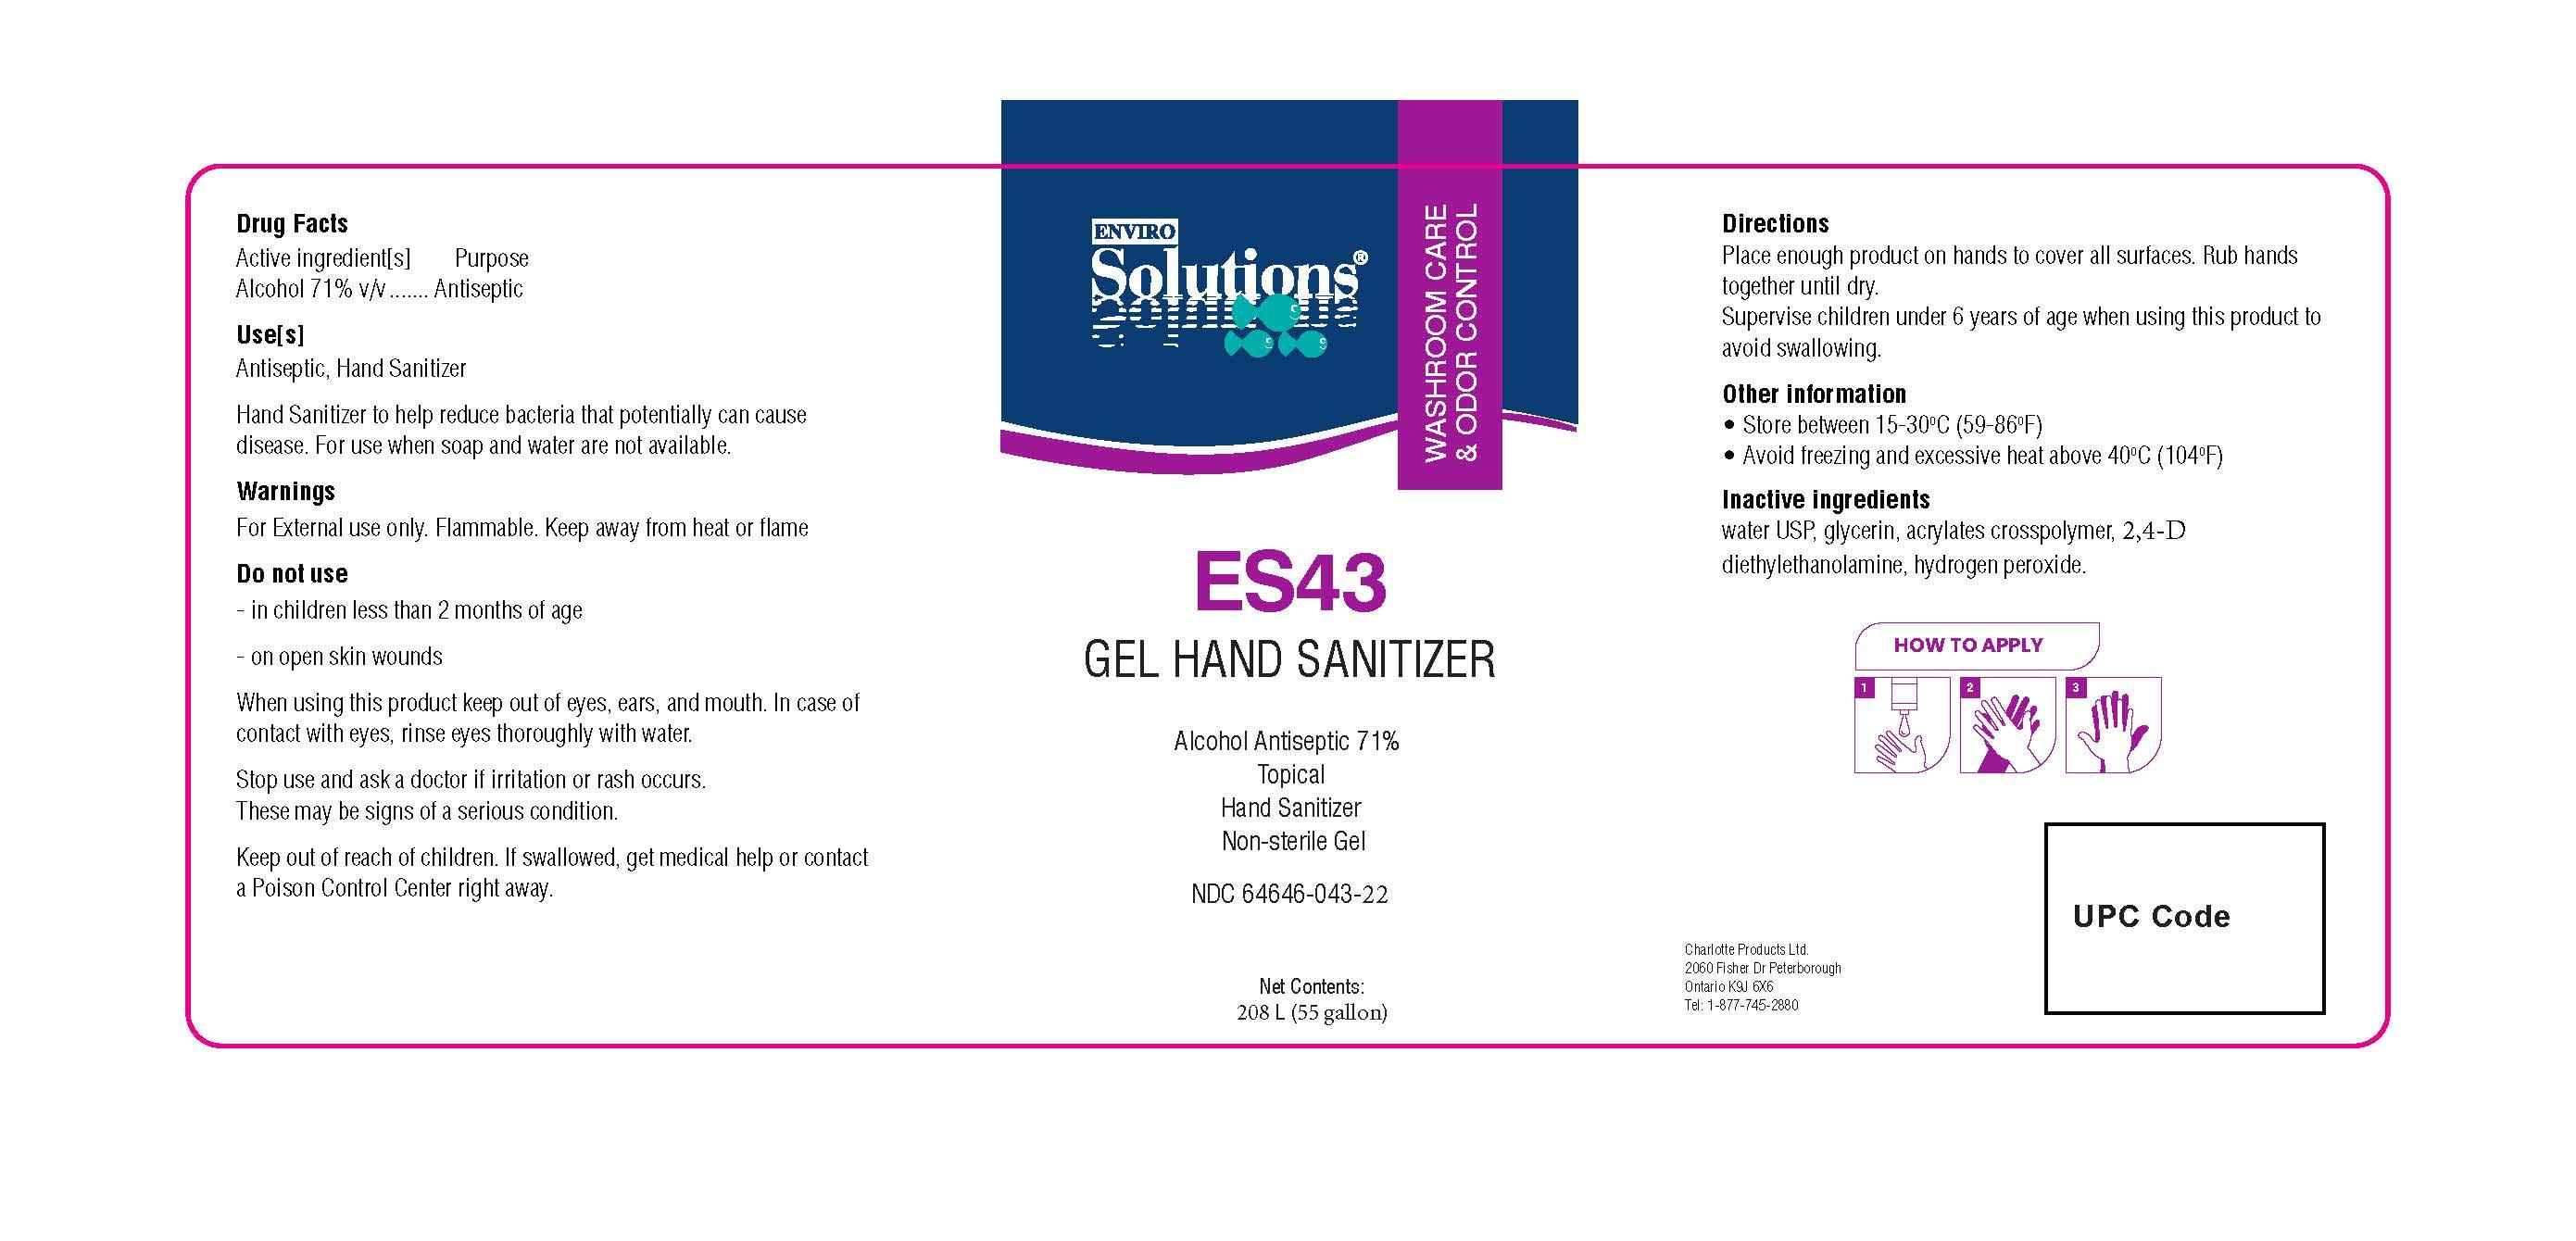 ES43 208L label